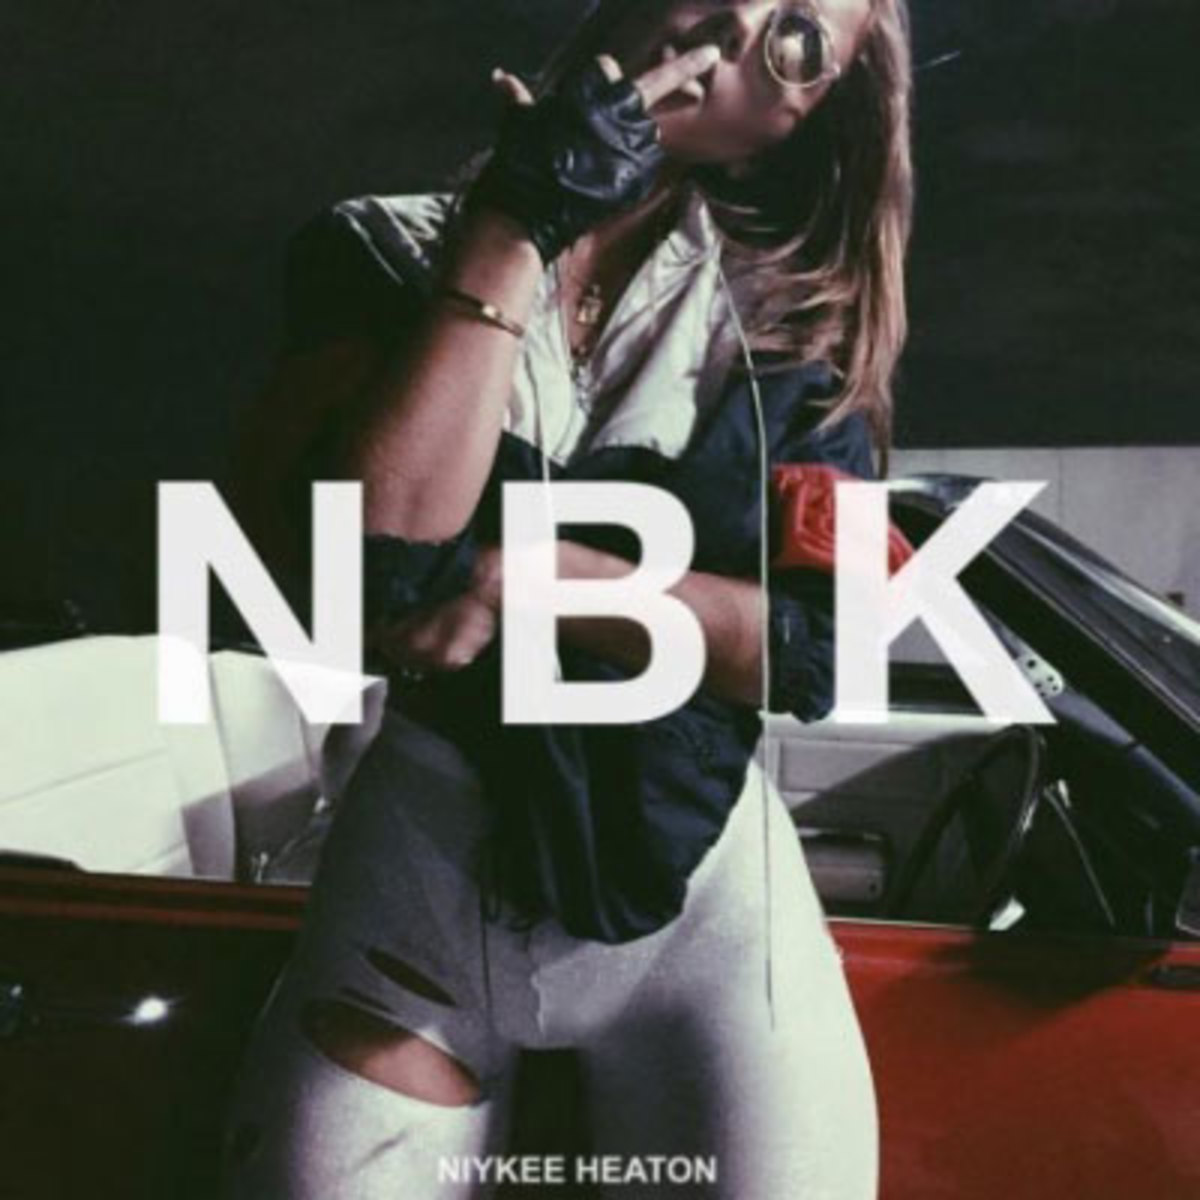 niykee-heaton-nbk.jpg